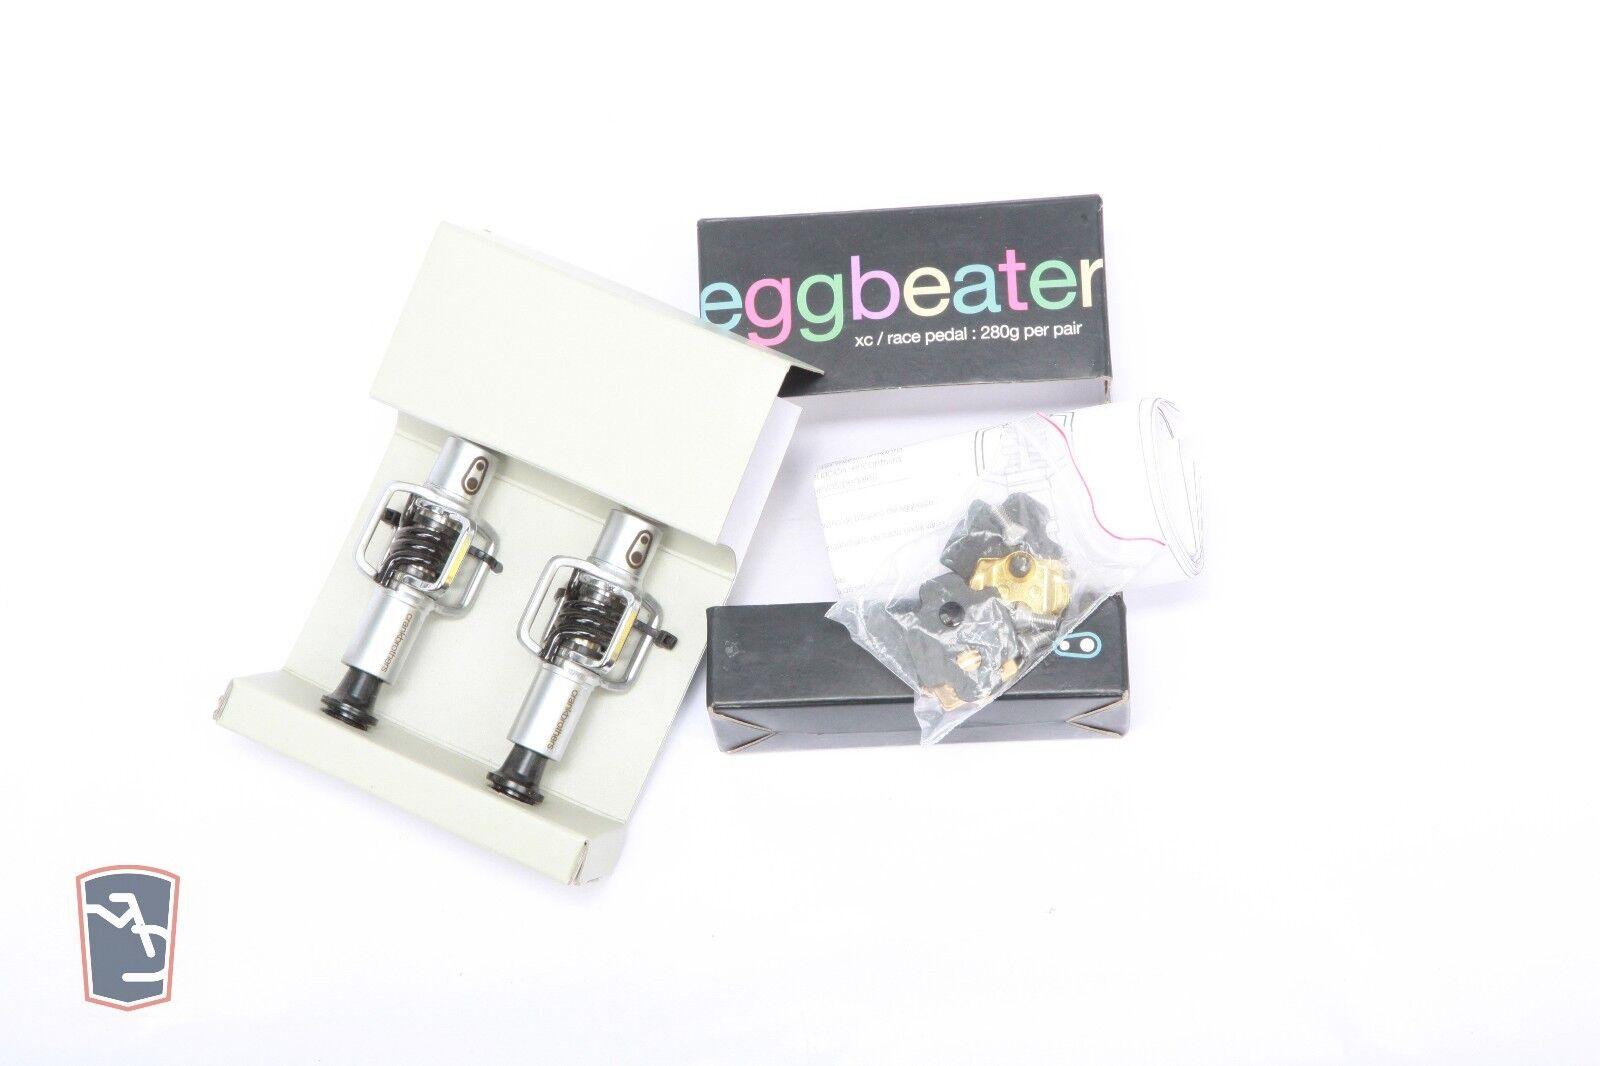 Crankbrother-Eggbeater 1 Pedale senza clip nero Mountain velocità in Discesa XC-A081